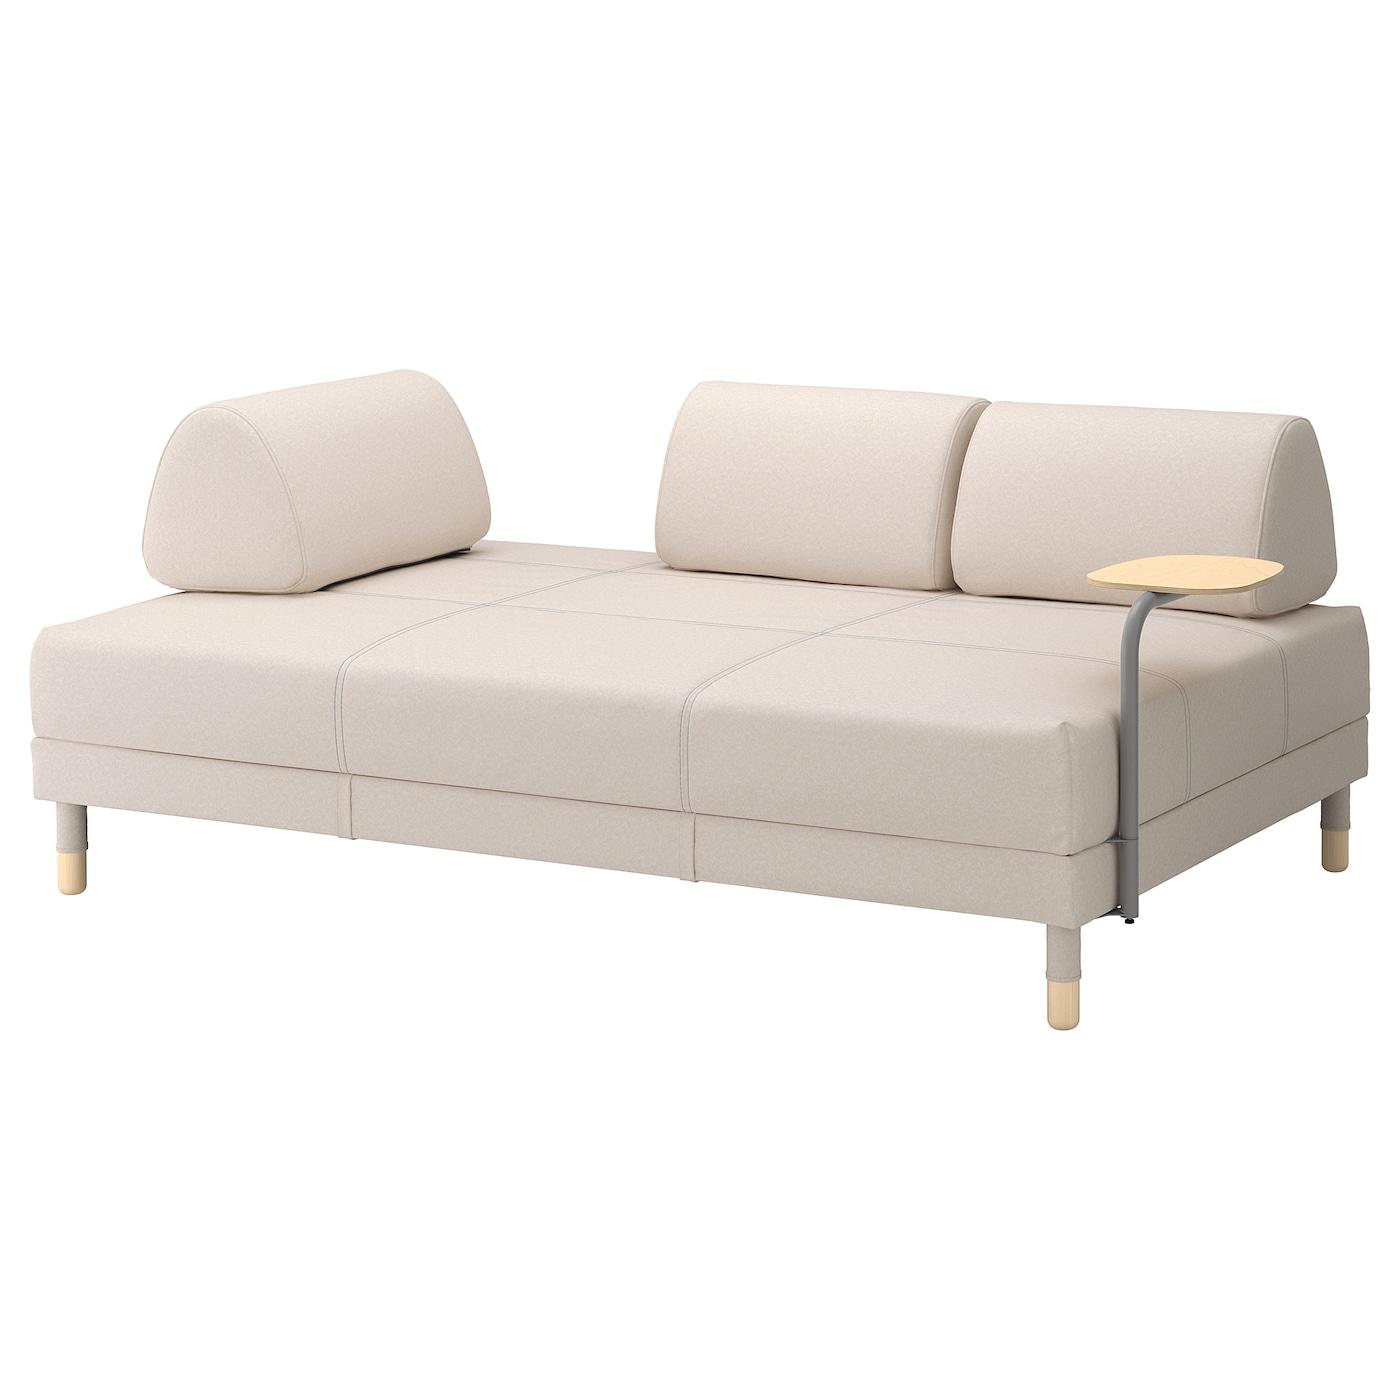 Sof s cama y sillones cama compra online ikea - Mesa auxiliar sofa ikea ...